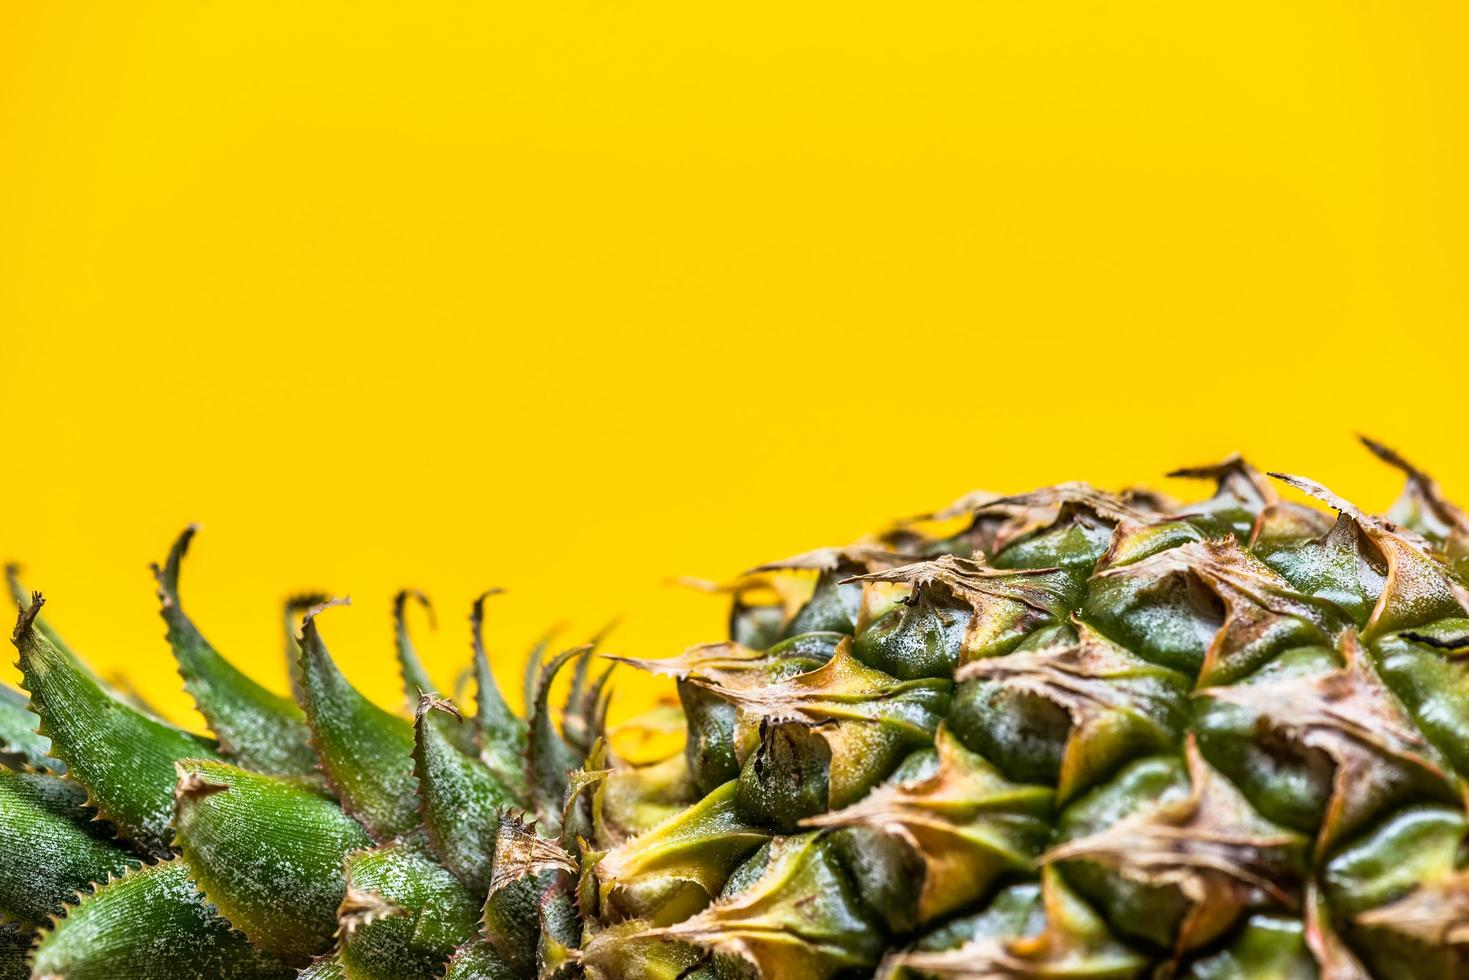 liggende ananas op eenvoudige gele achtergrond foto